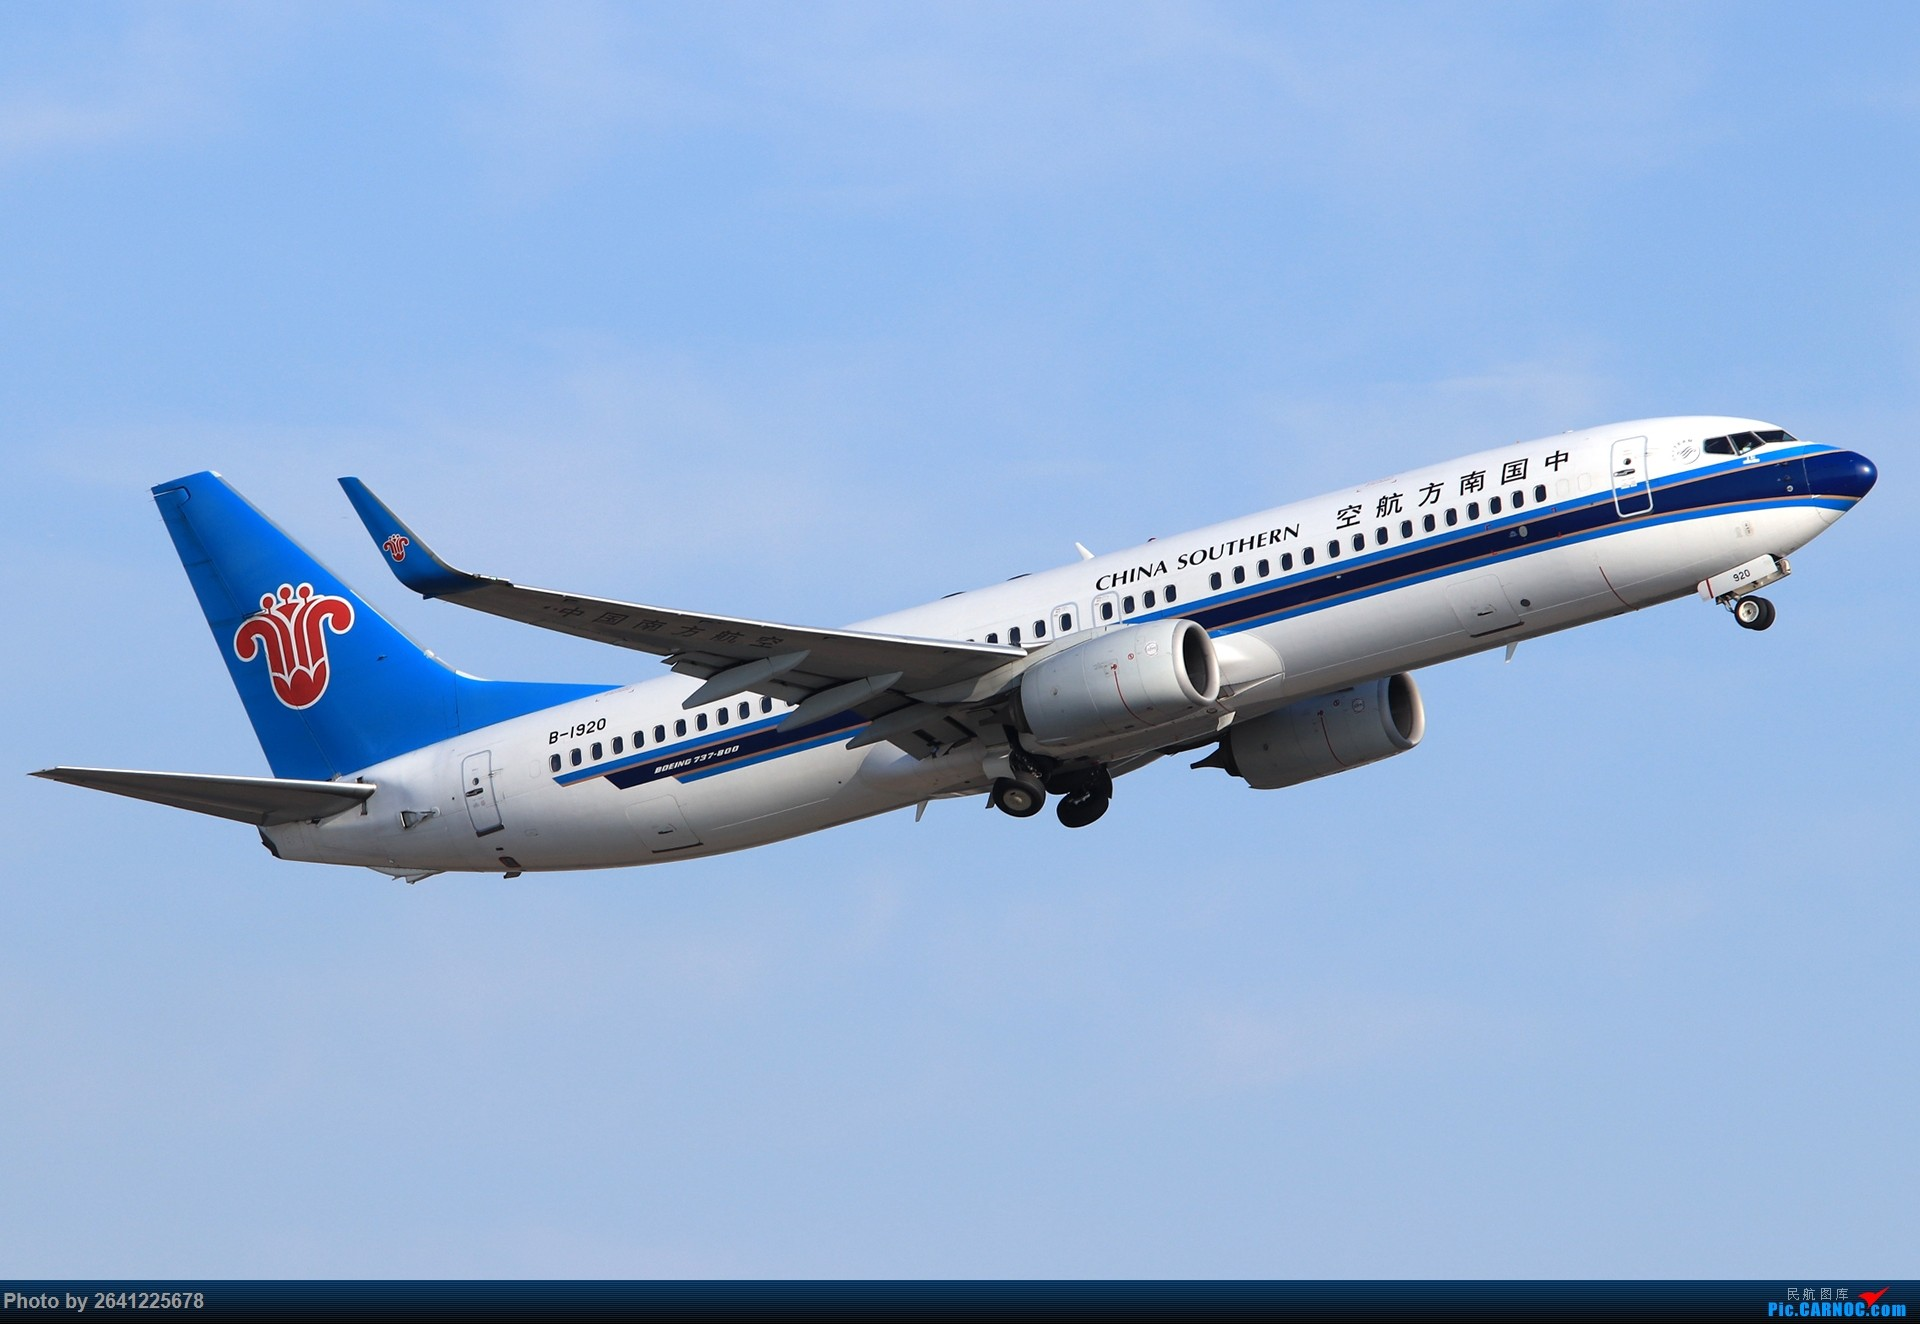 Re:[原创]【小周游记第7集拍机贴】乌鲁木齐绝美的地景和光线 BOEING 737-800 B-1920 中国乌鲁木齐地窝堡国际机场